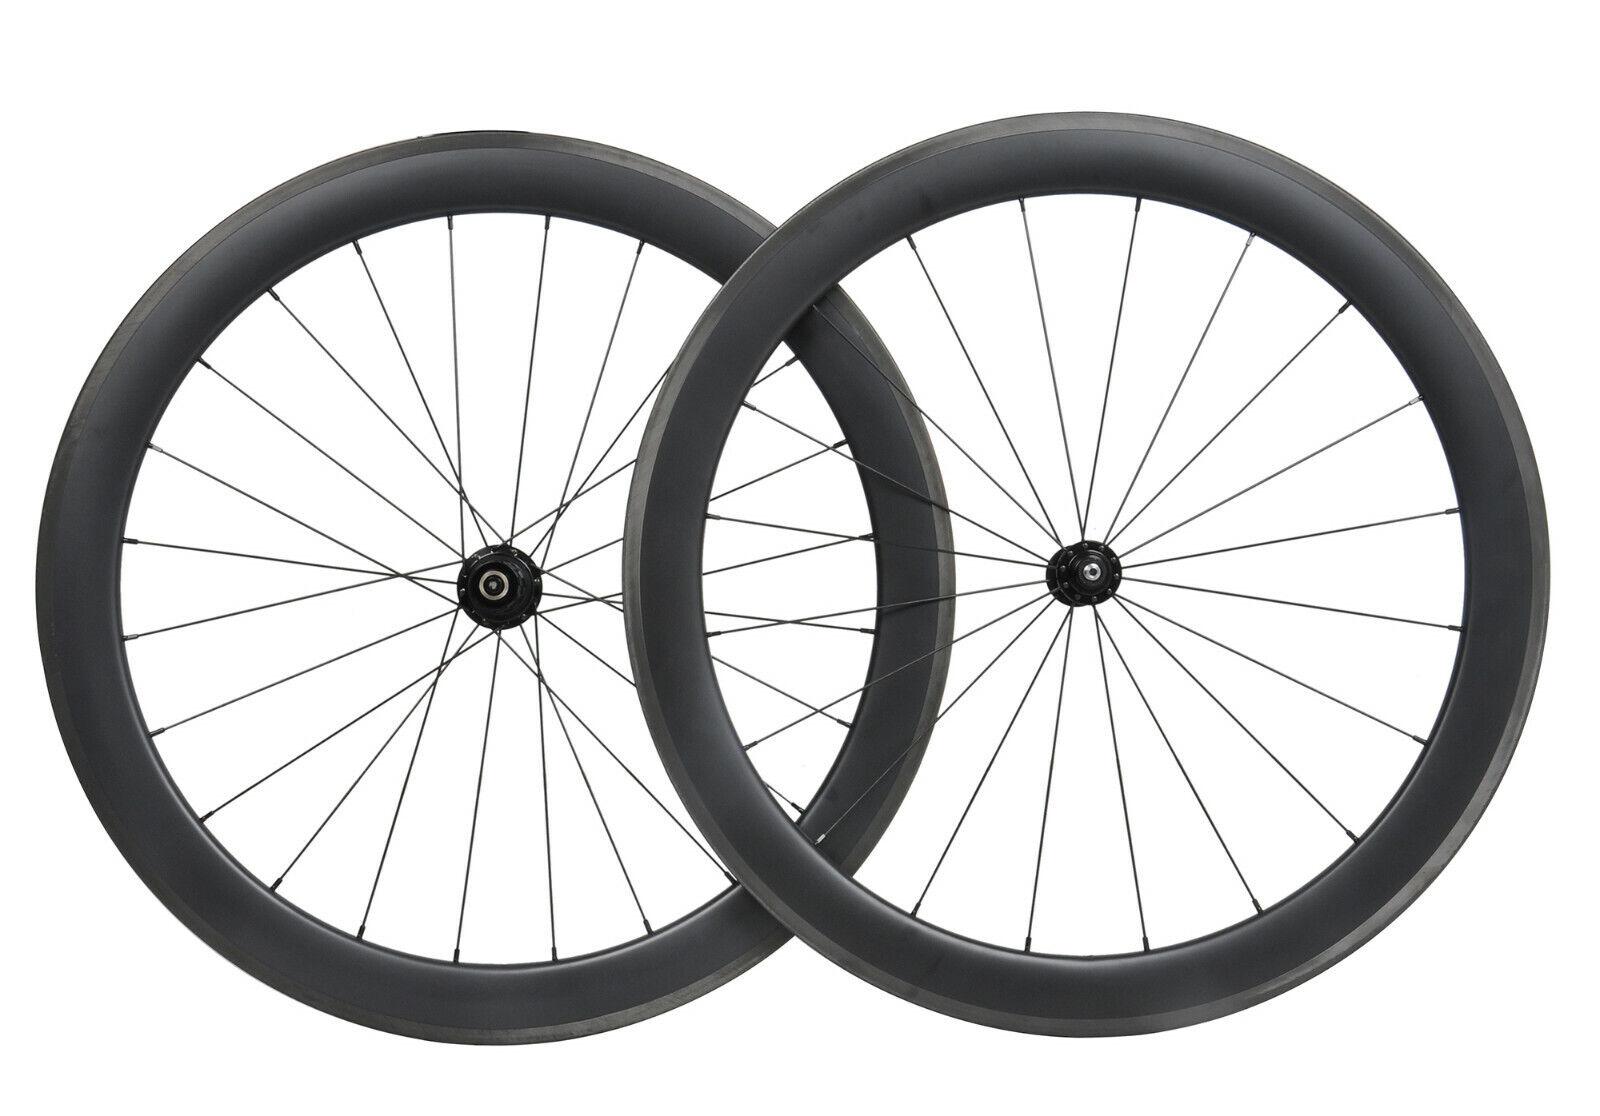 Carbon  wheels clincher 55mm matt road bicycle wheelset 700C Tubeless race rim  beautiful